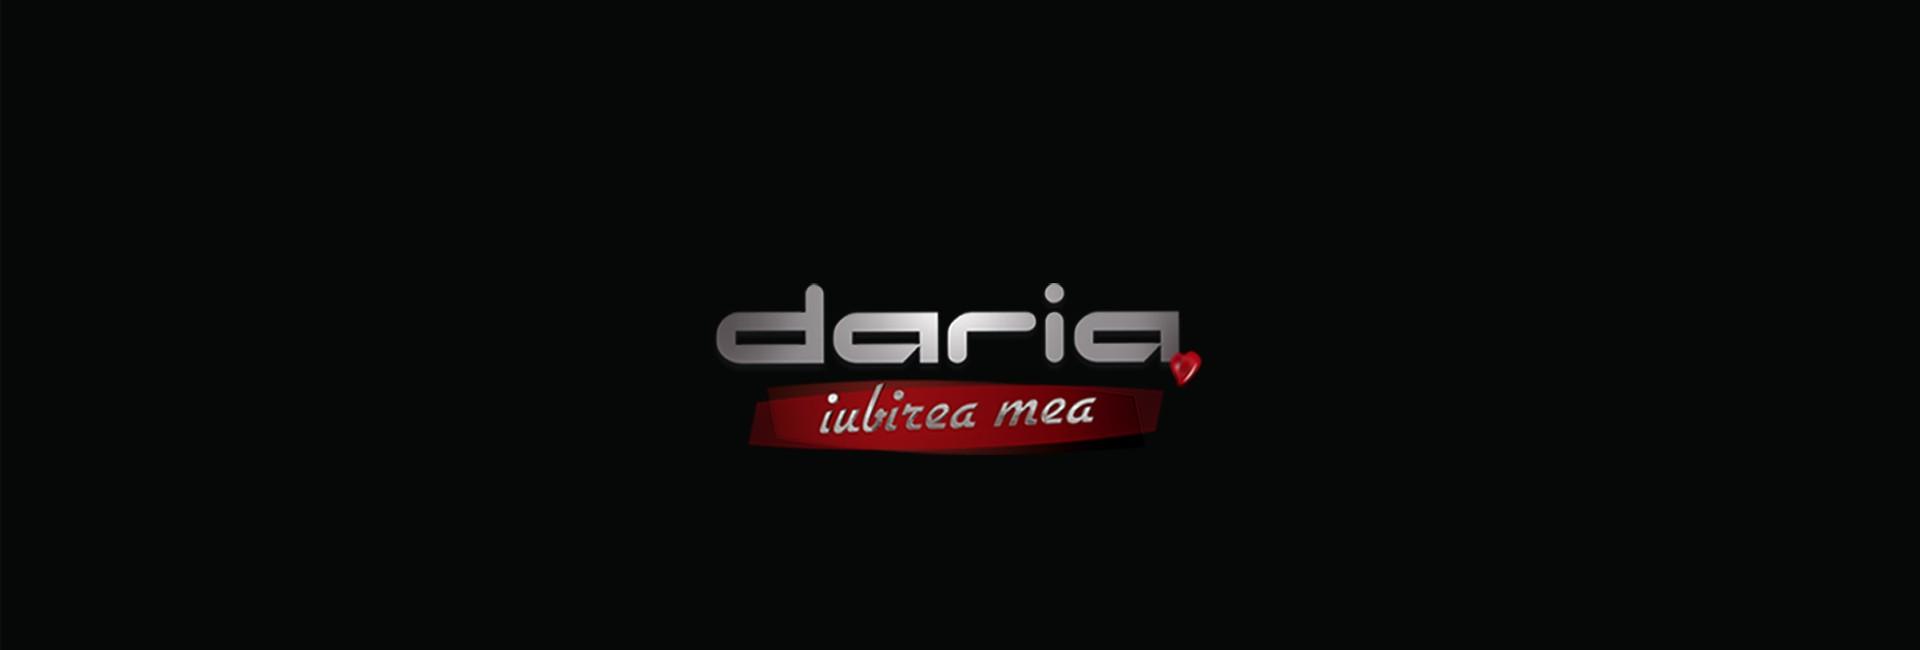 Daria, iubirea mea